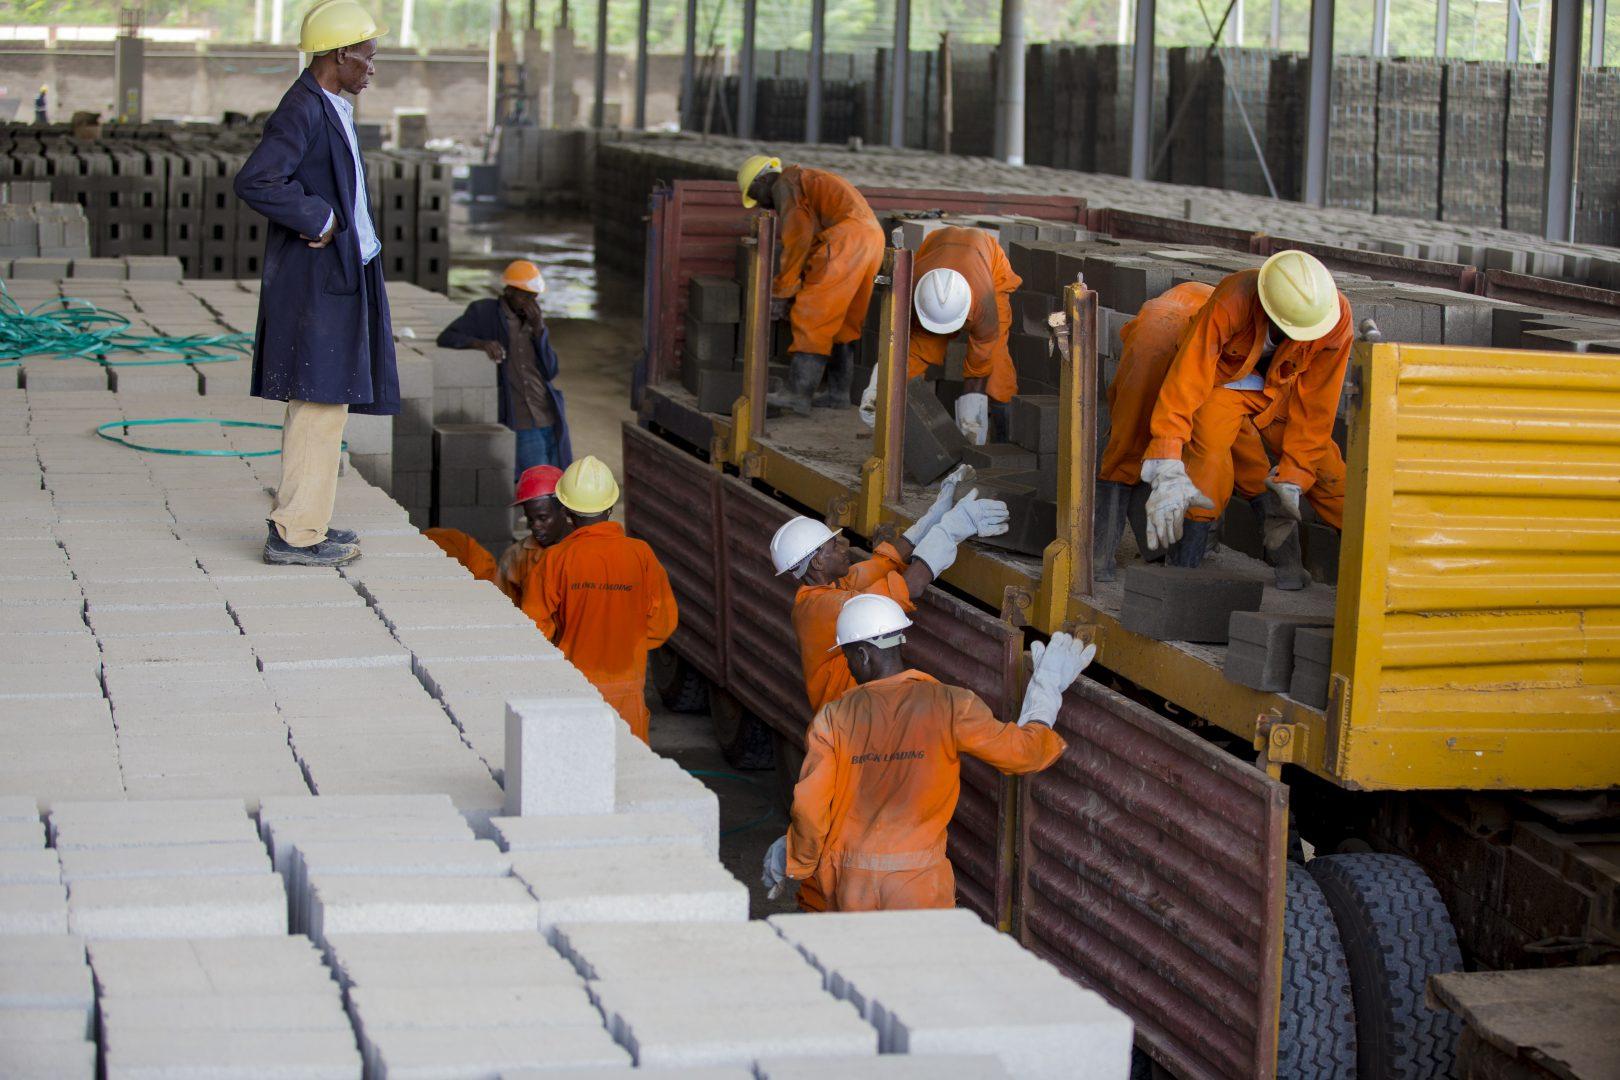 Men unloading cinder blocks from a truck.